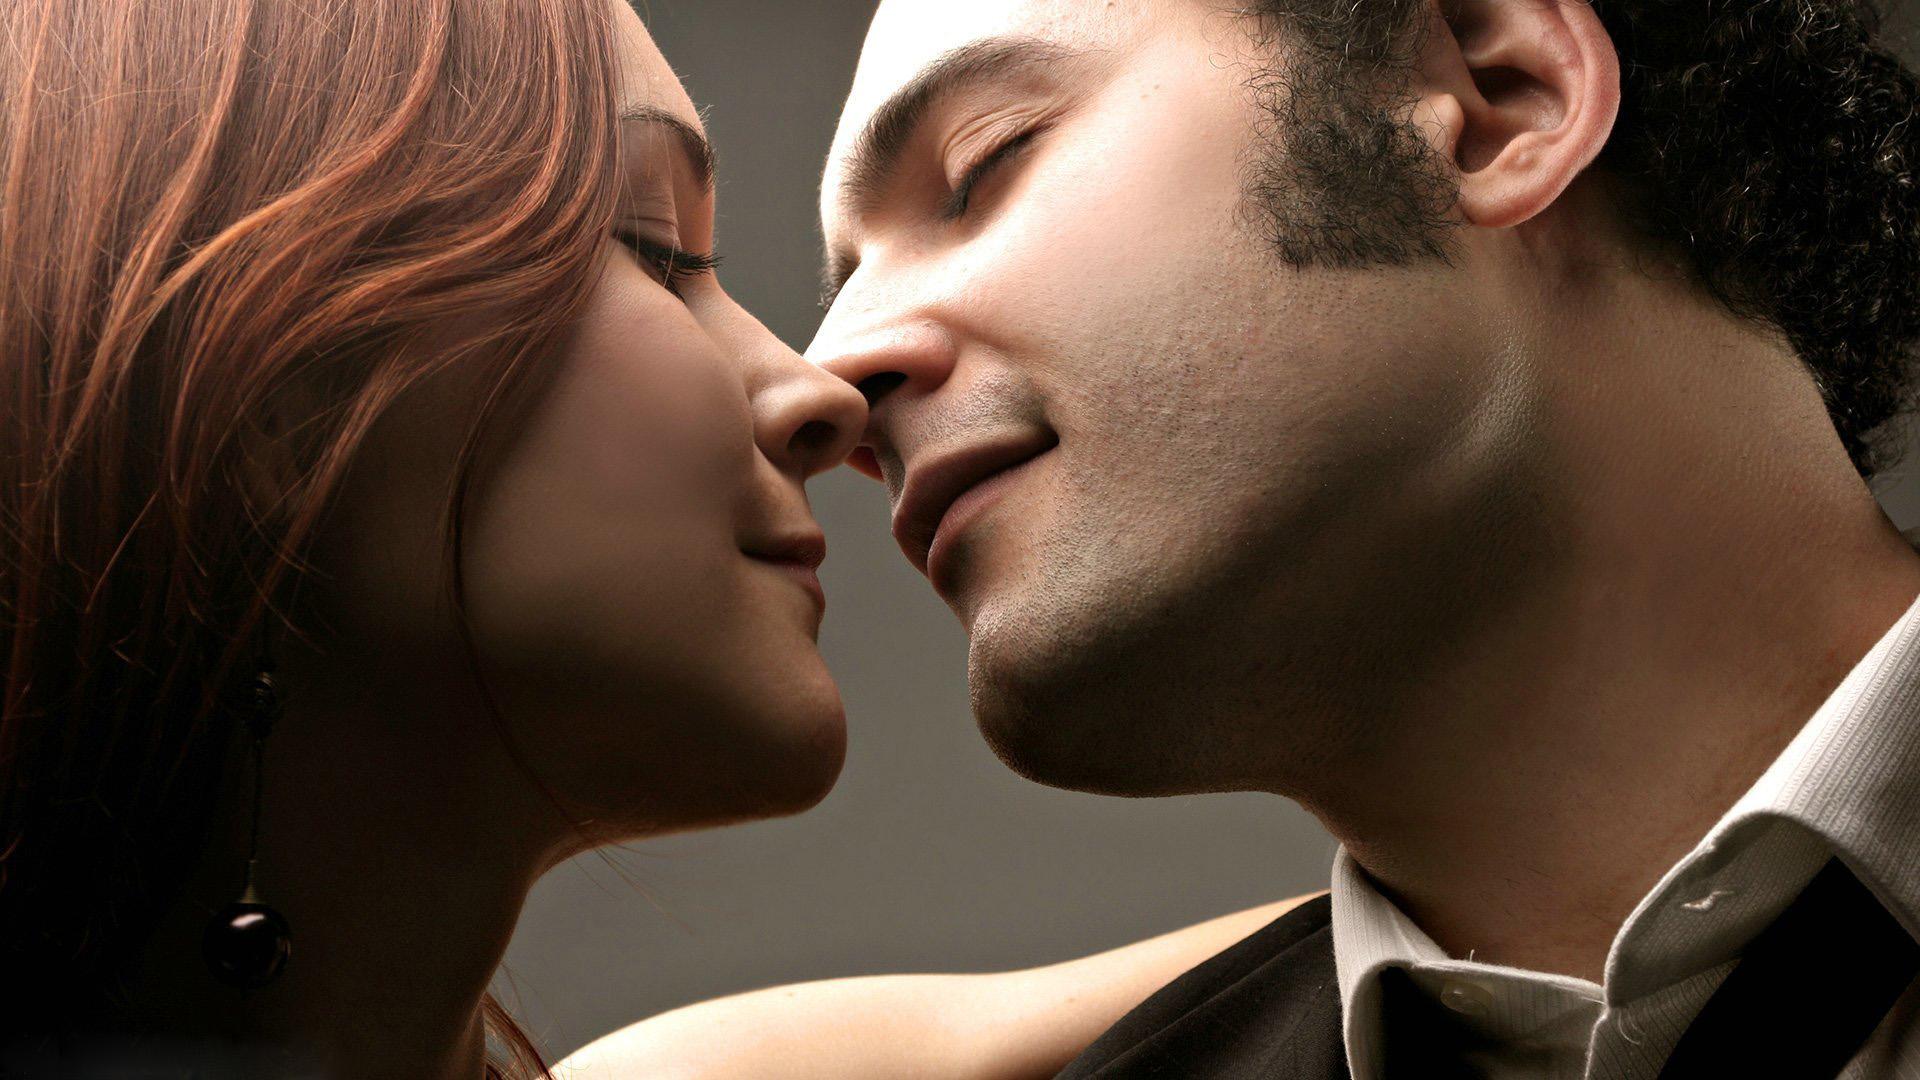 types of kisses - eskimo kiss - nose kiss